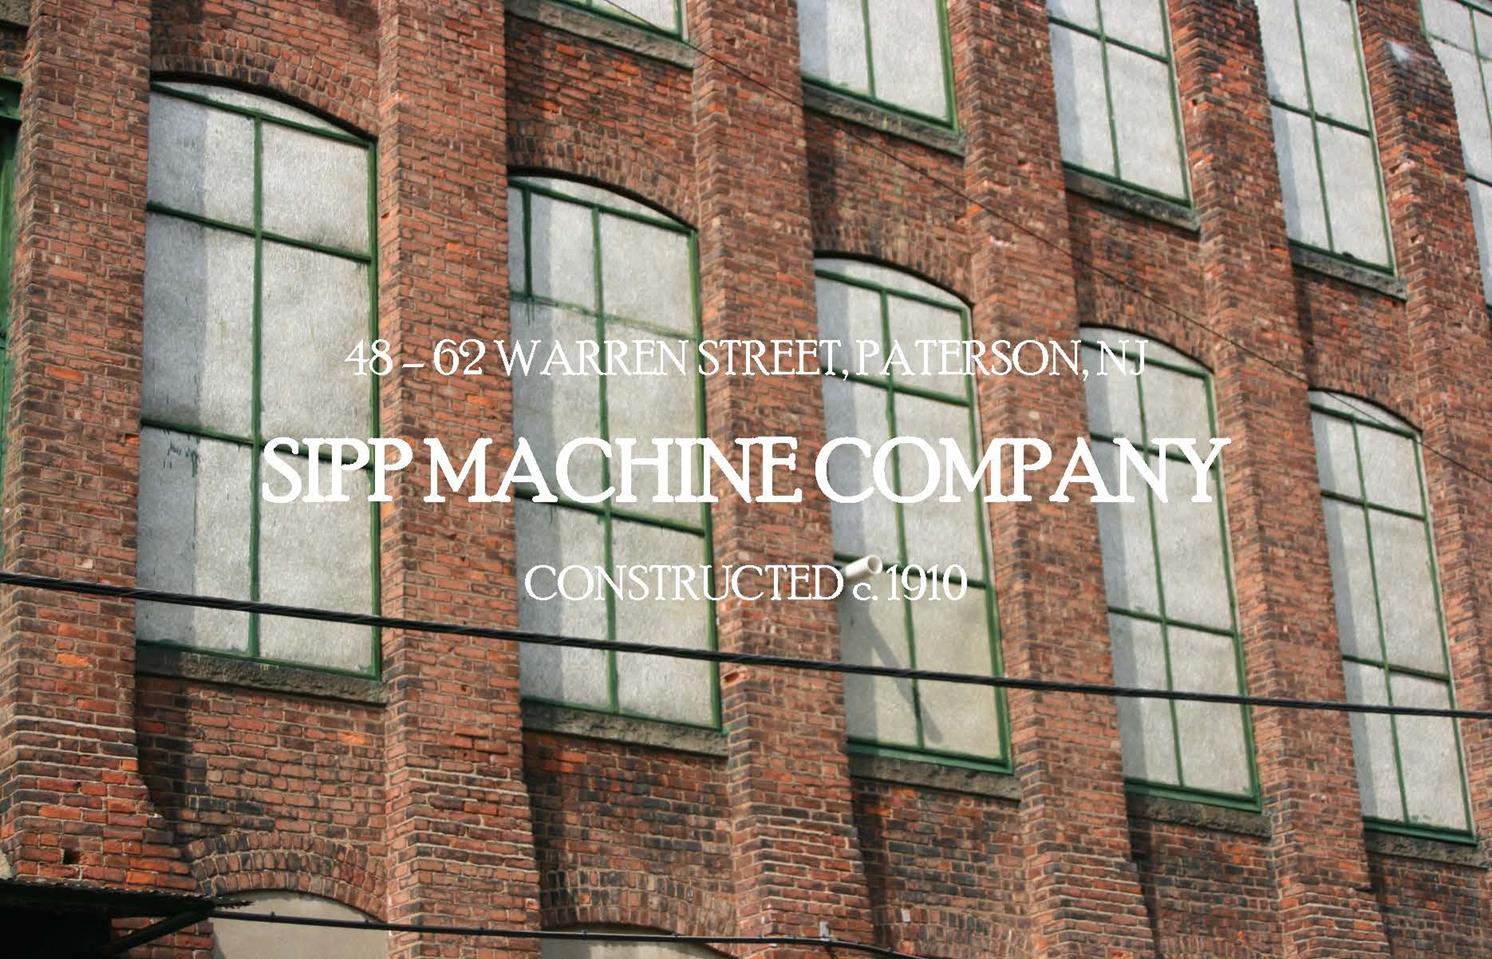 Sipp Machine